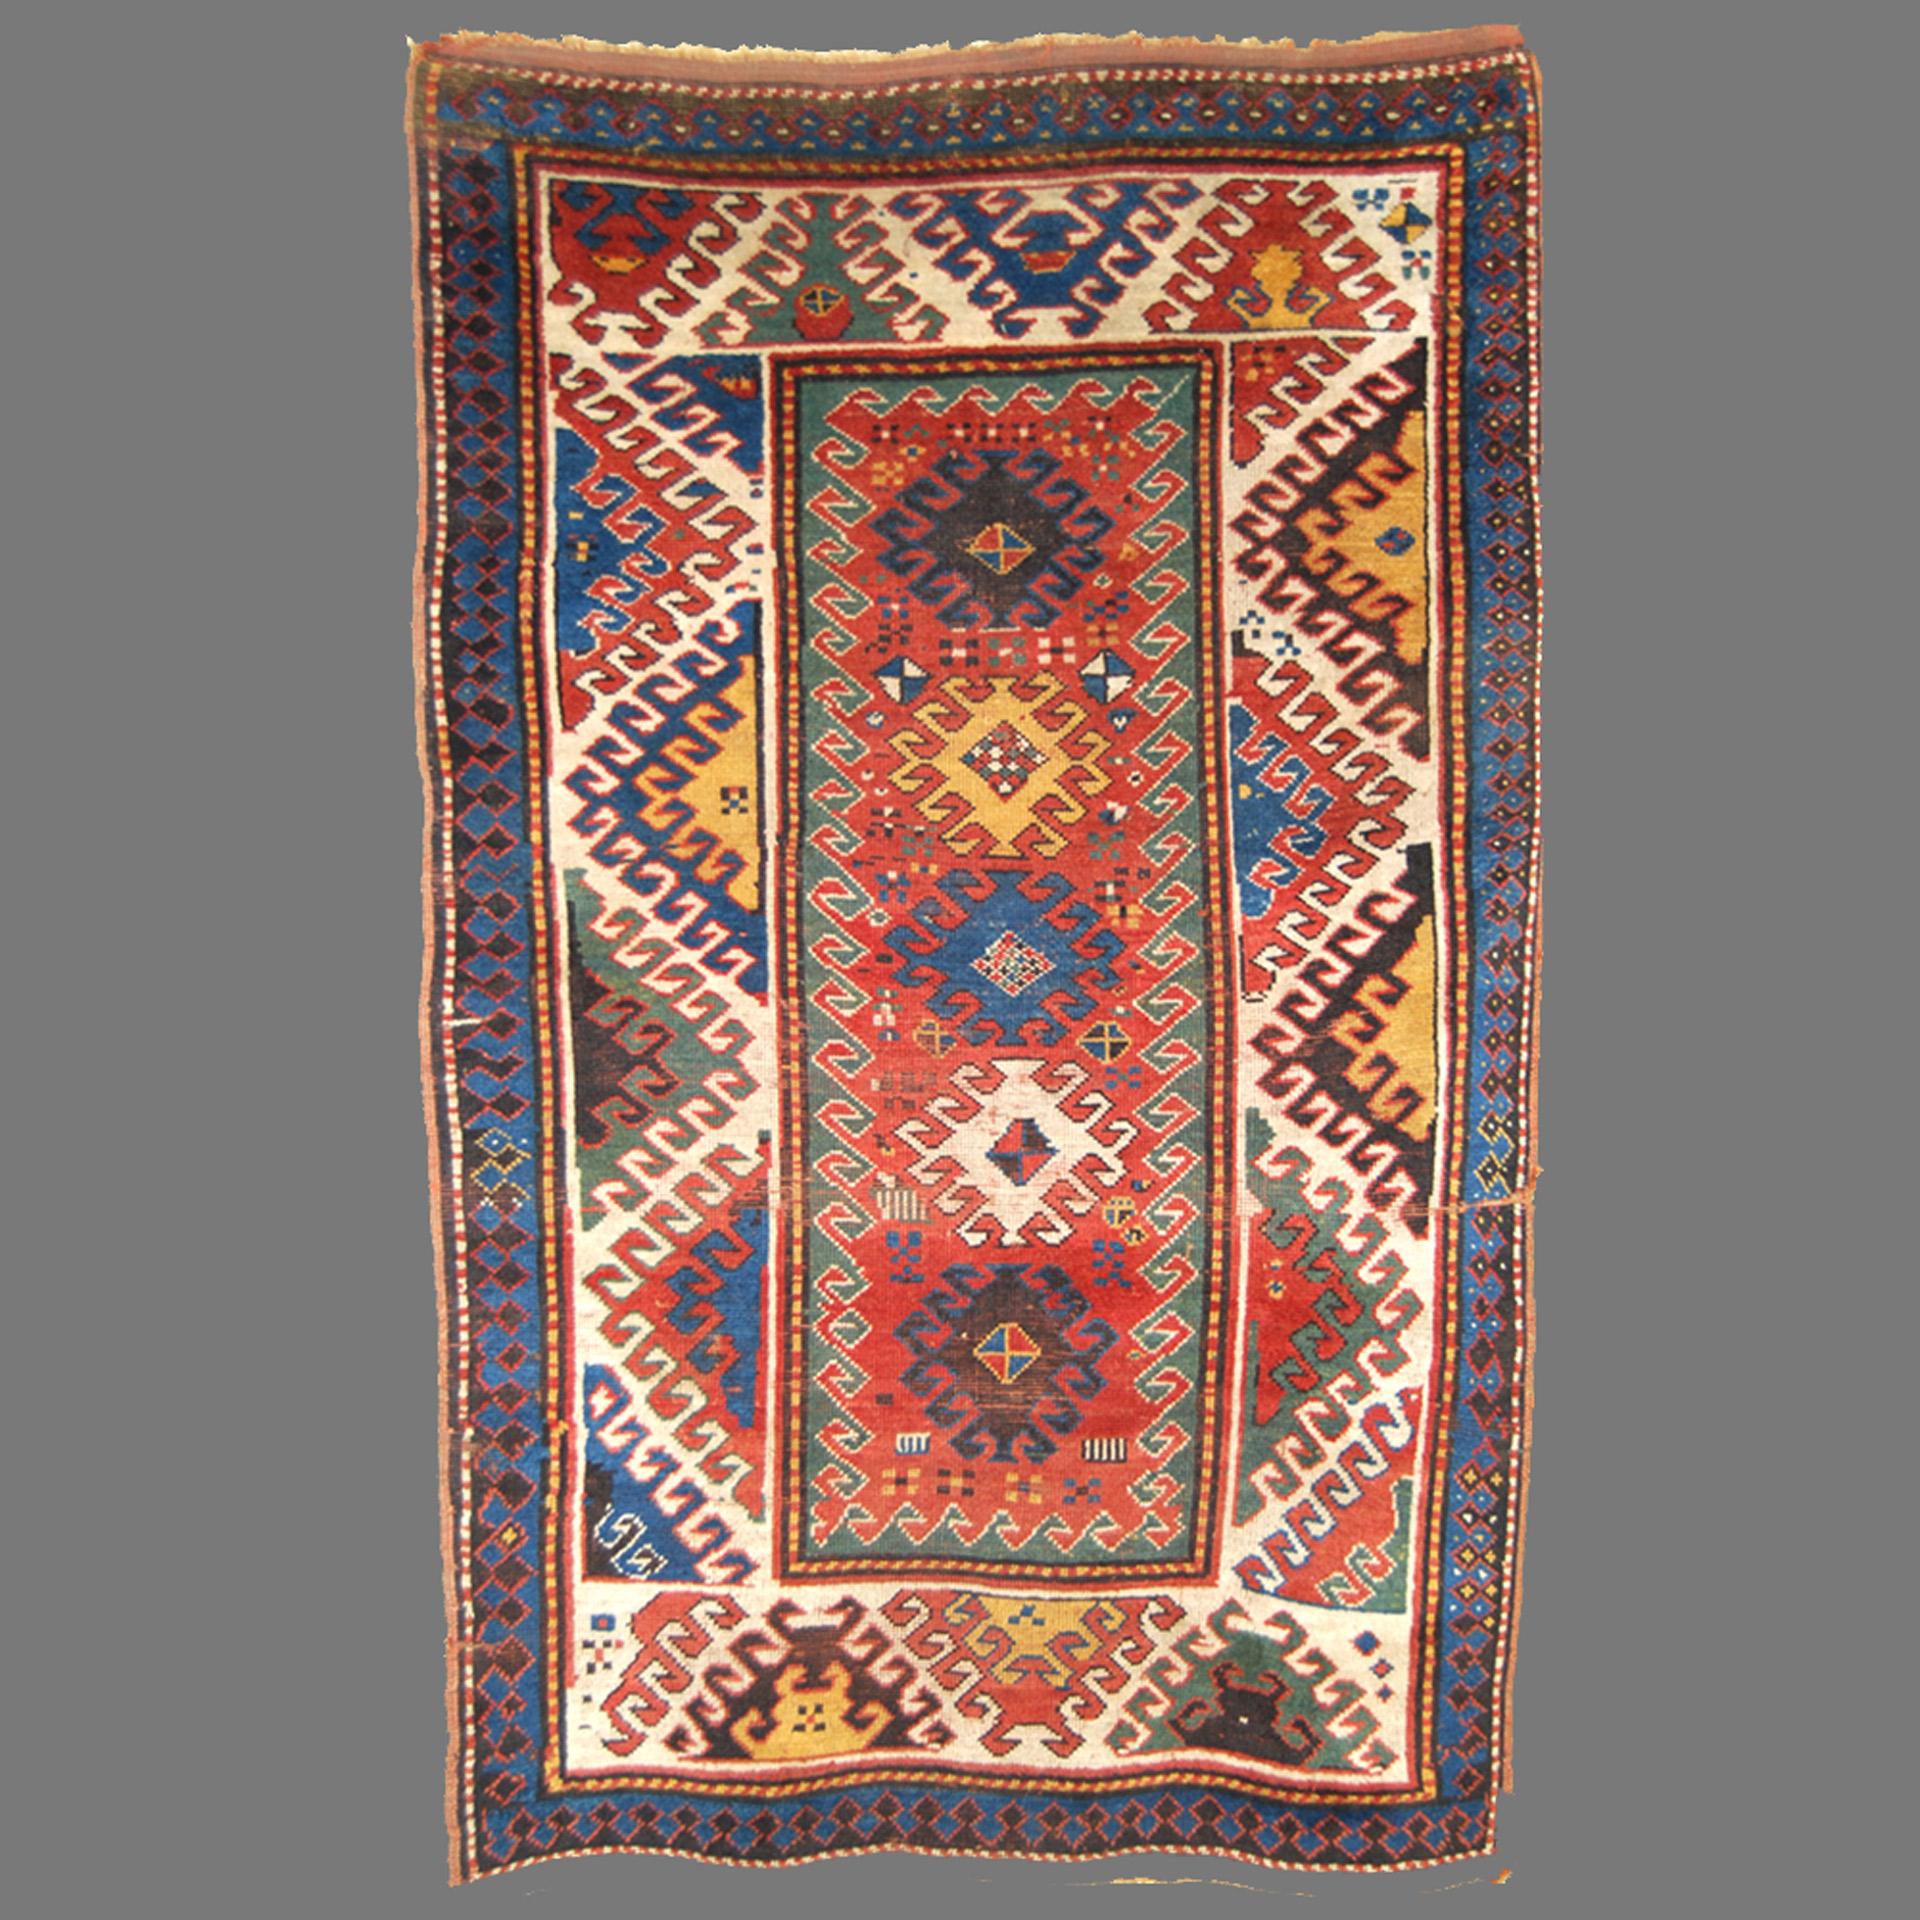 Antique Caucasian Bordjalou Kazak rug with a terra cotta field and an ivory eye dazzler border, circa 1890